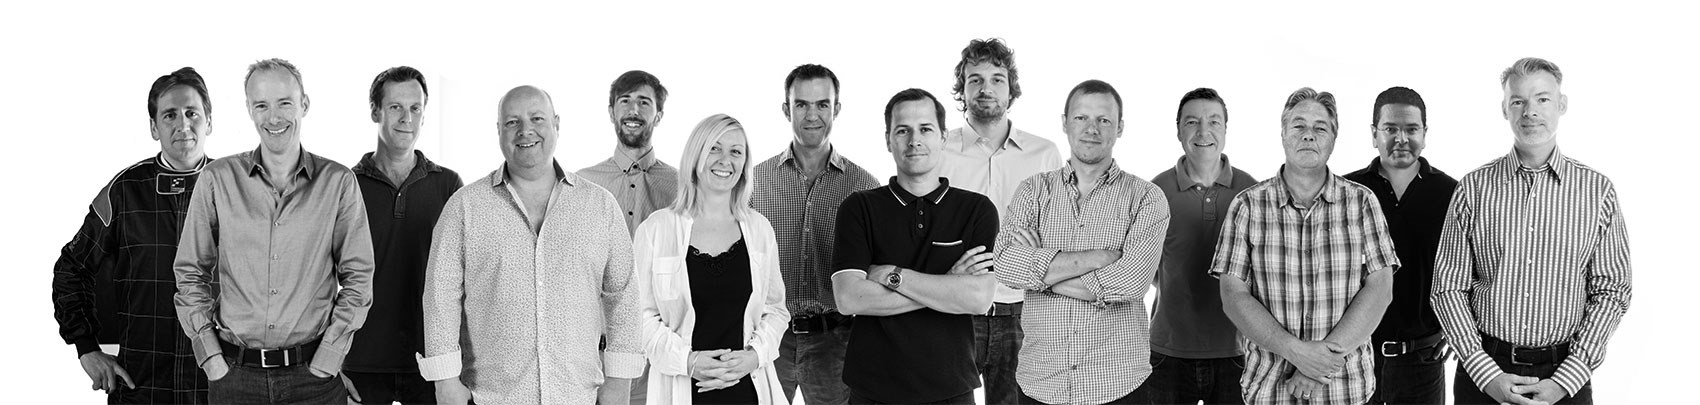 CAR magazine editorial team: the journalists behind CAR